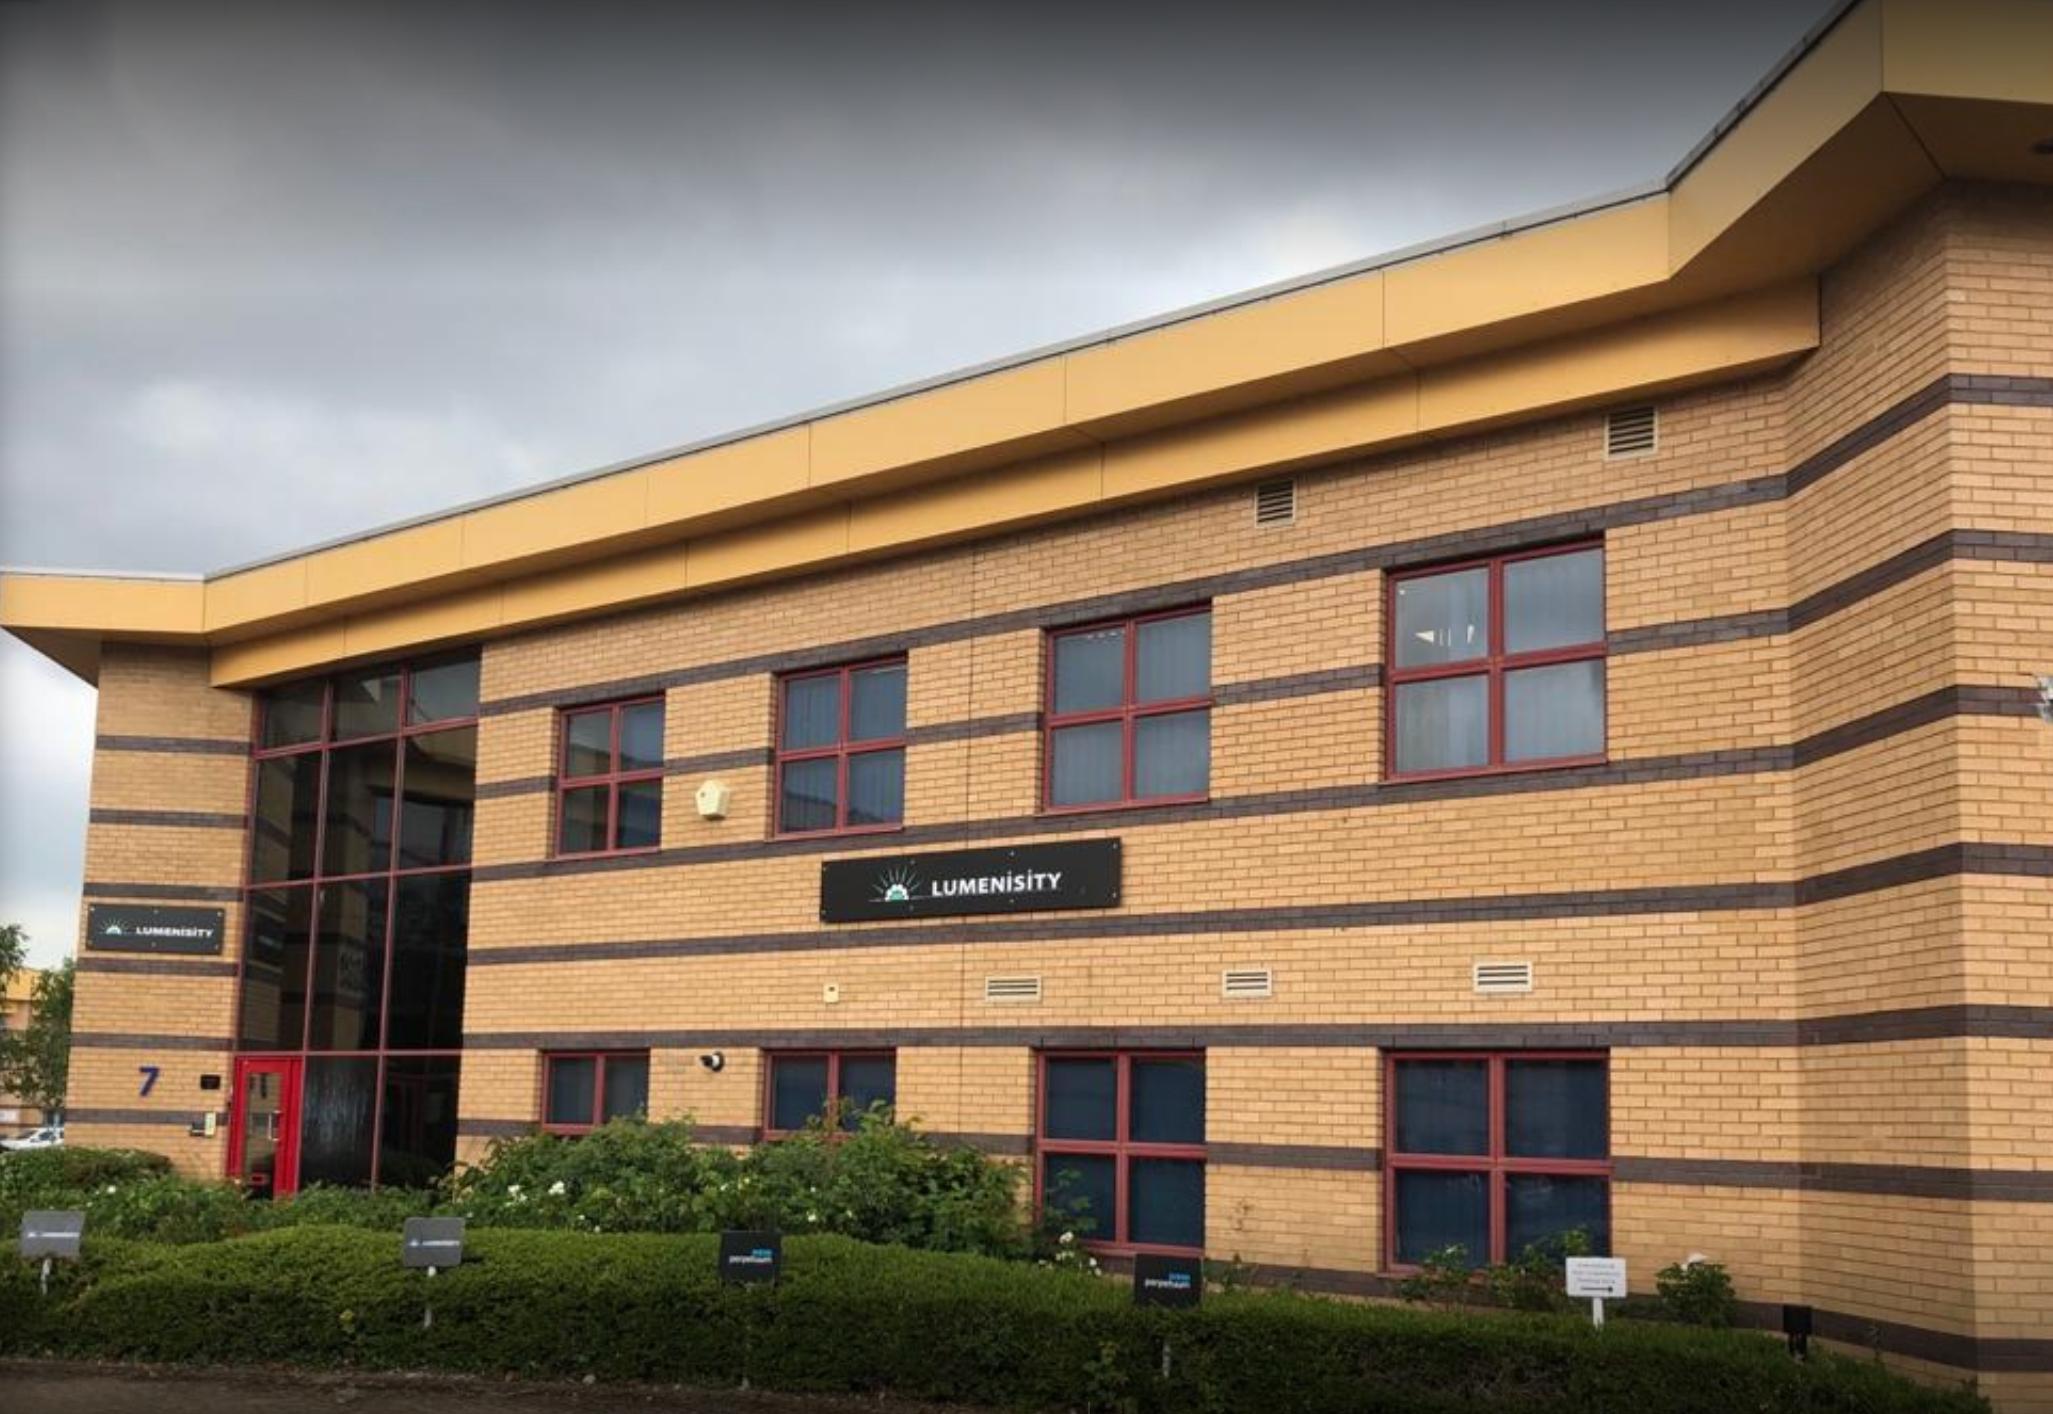 Image of Lumenisity Headquarters building